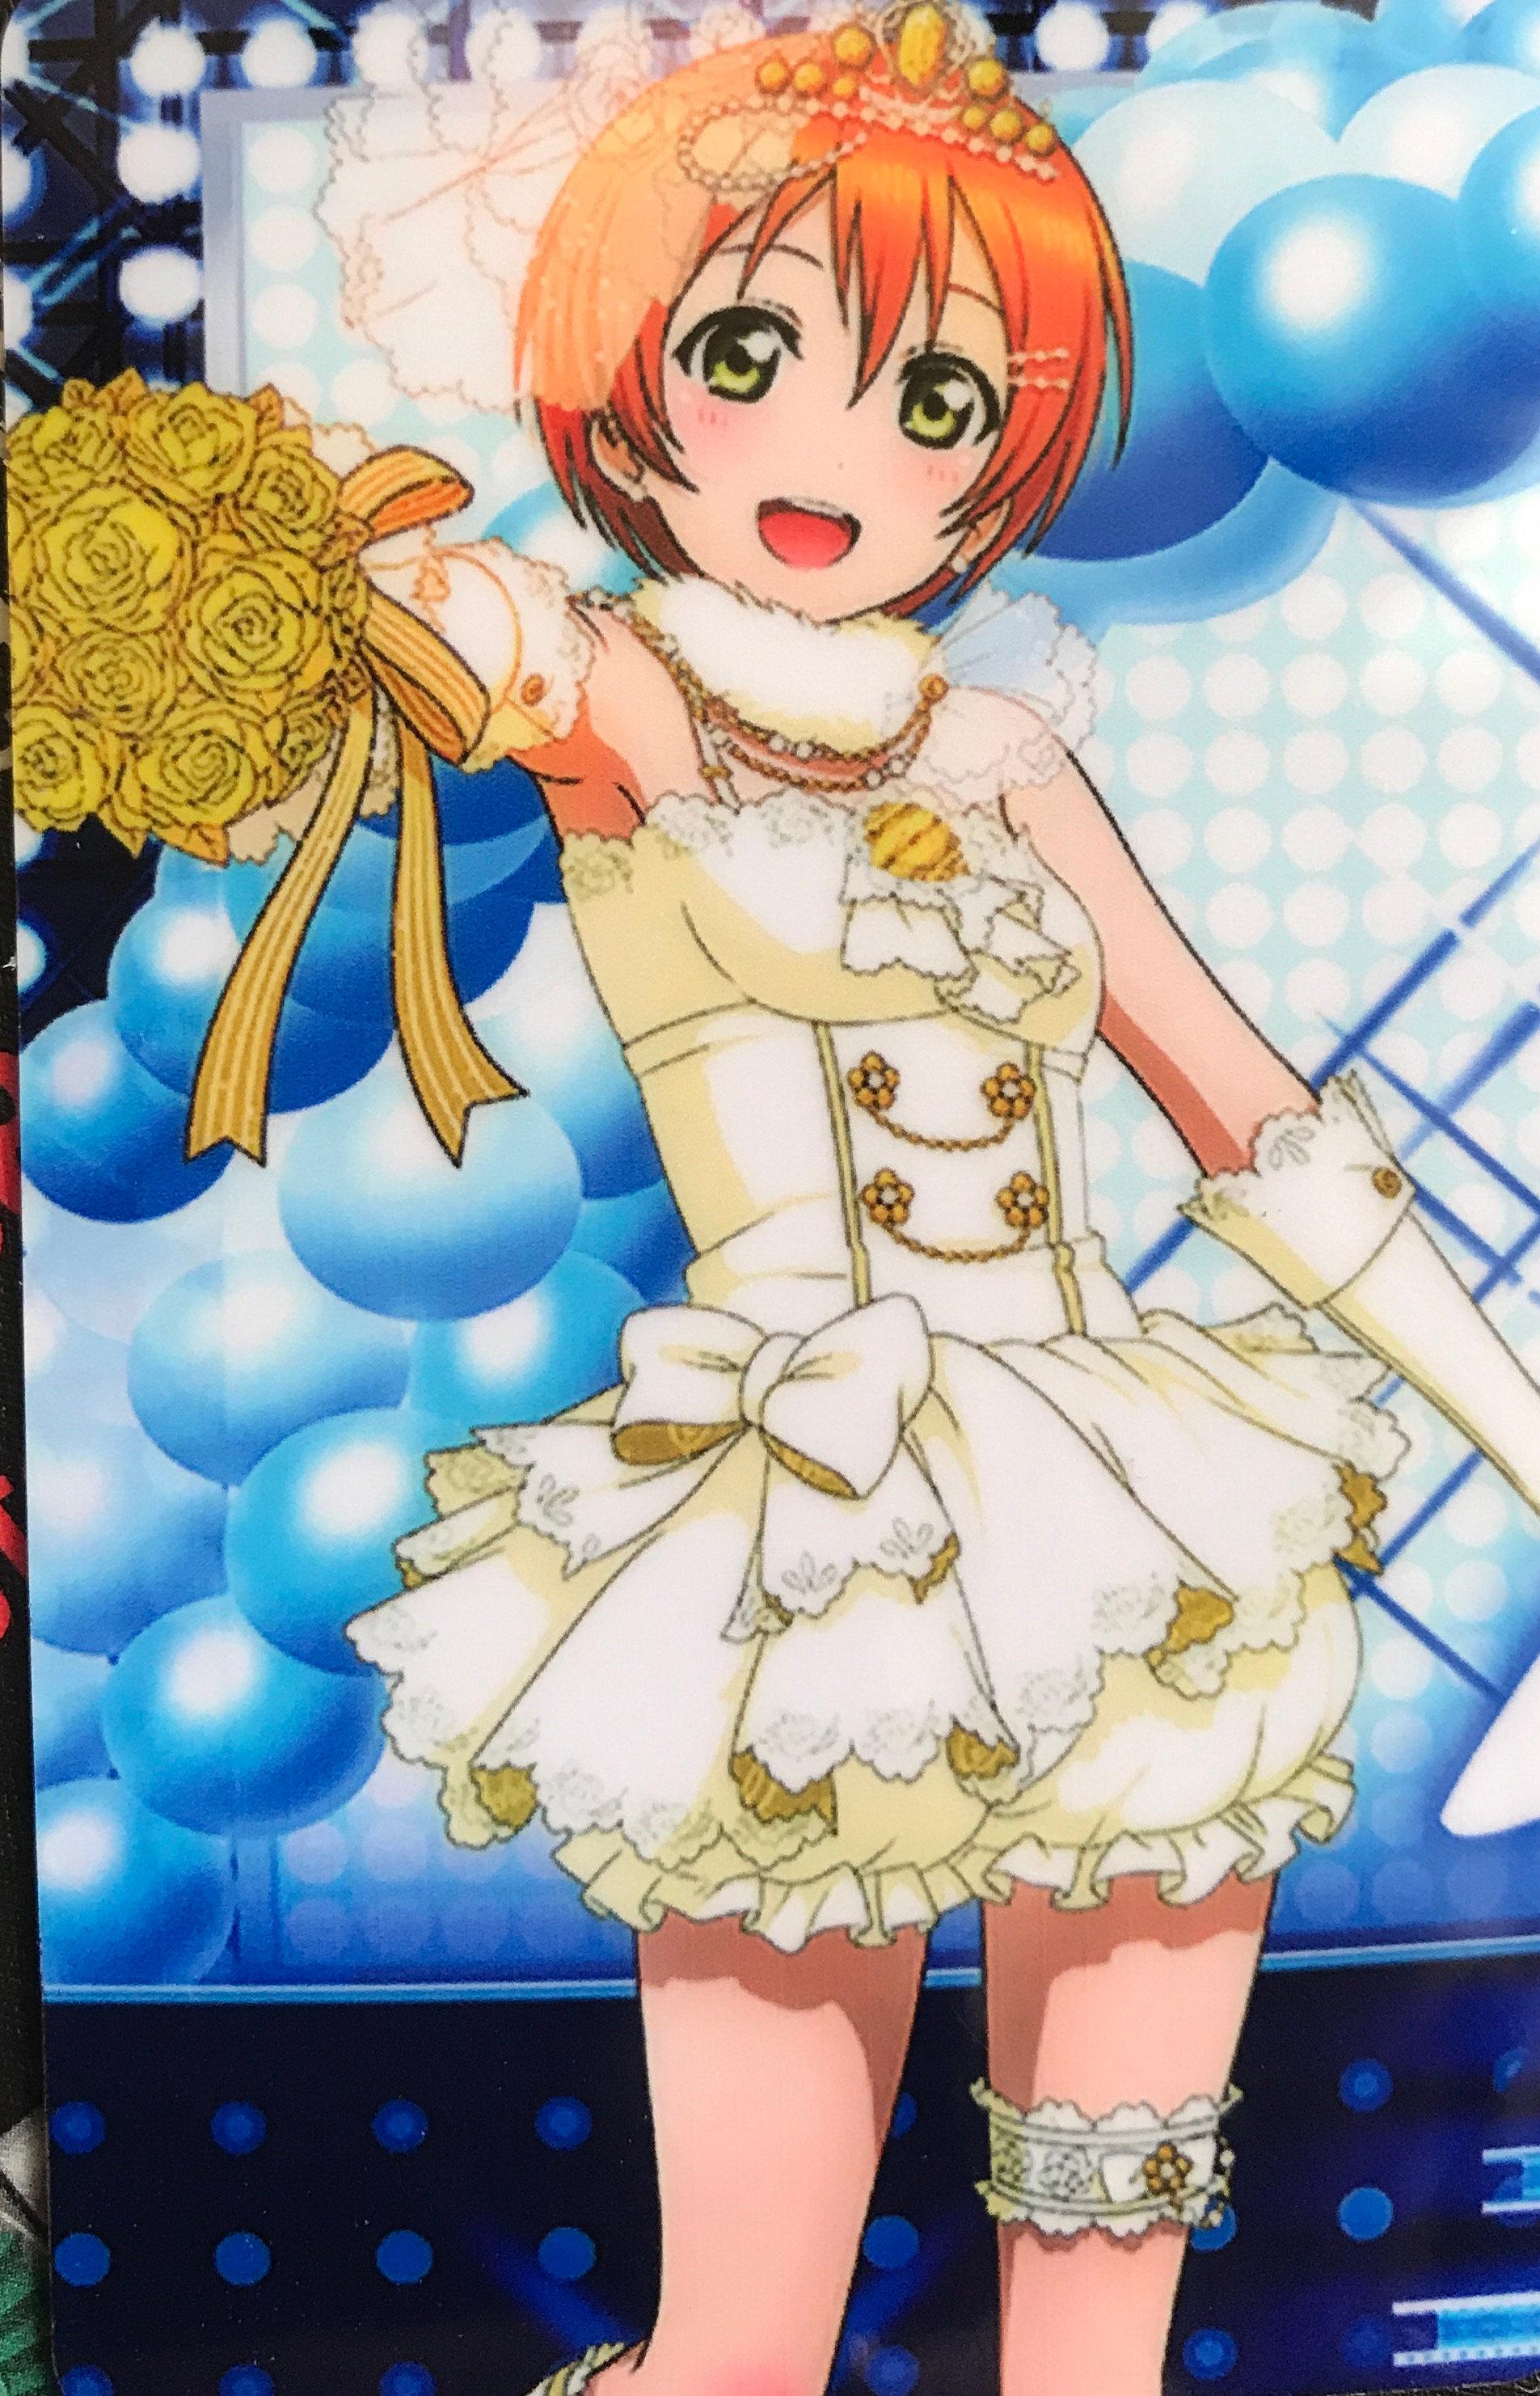 Love Live! Hoshizora Anime Sticker Decal Large 03